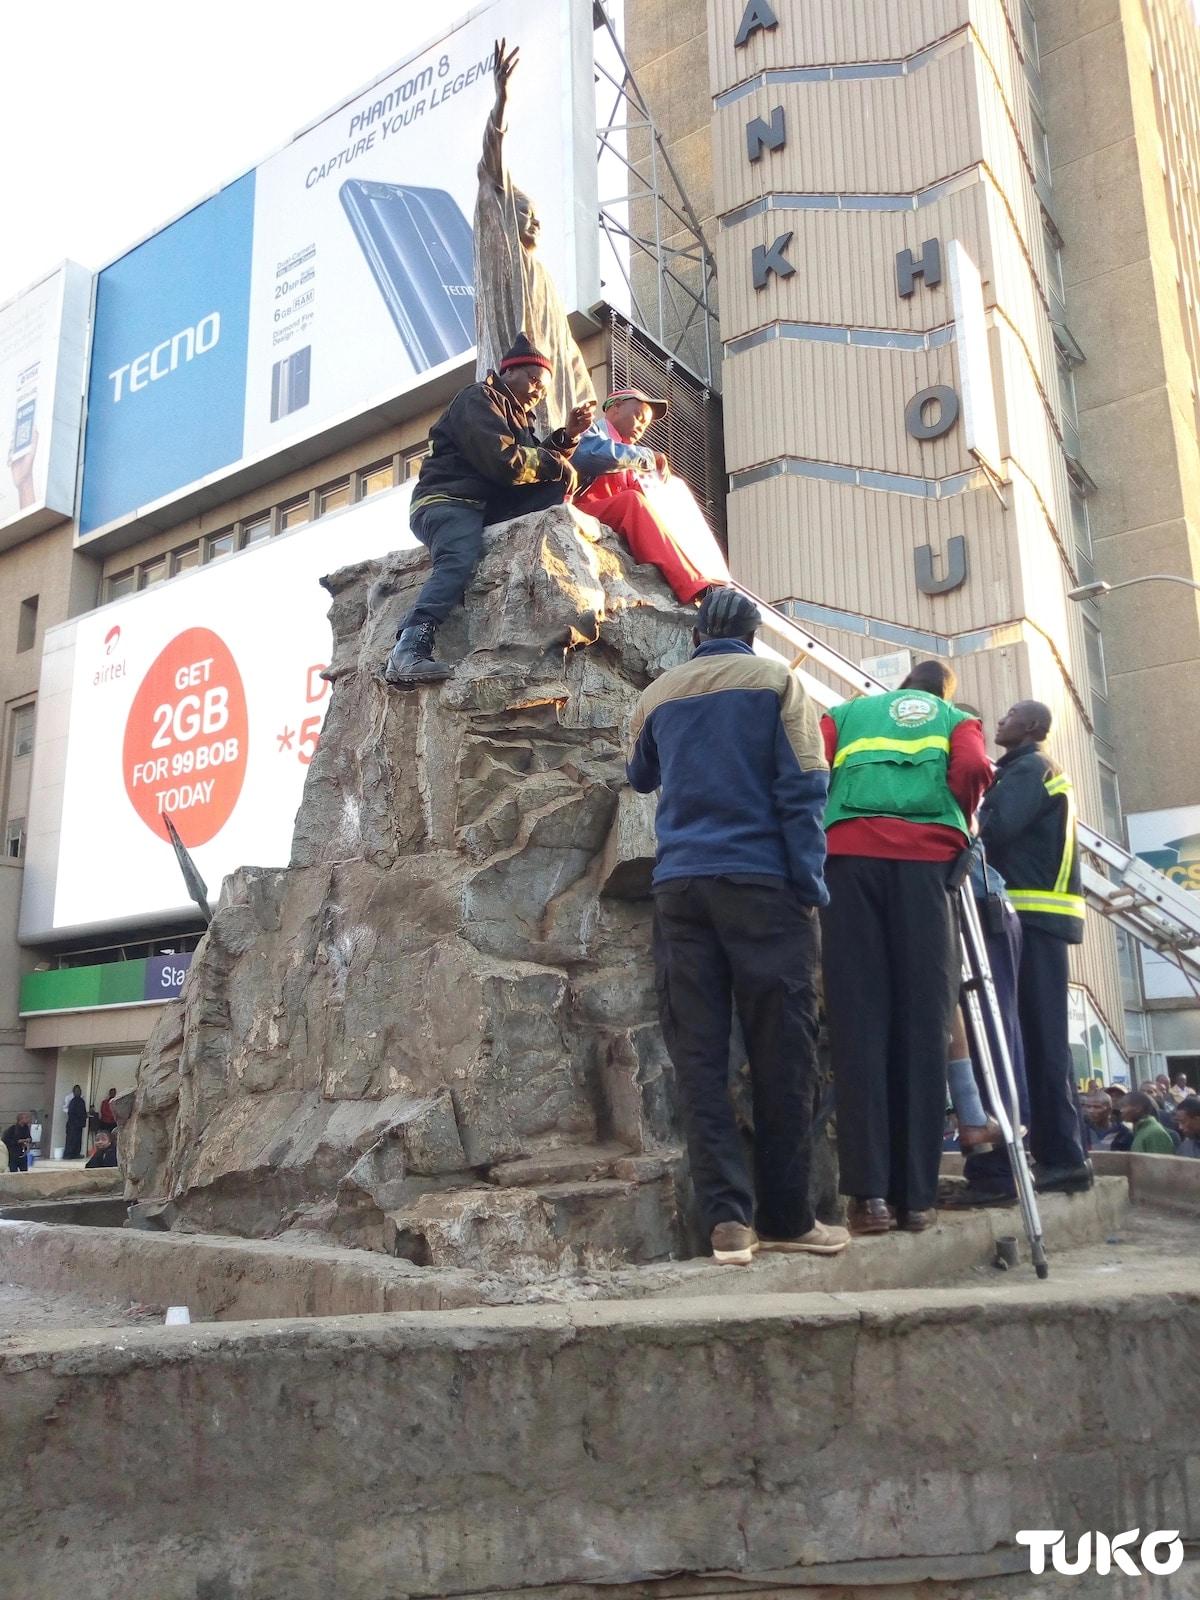 Man chains himself on Tom Mboya's statue, blames Uhuru and Sonko